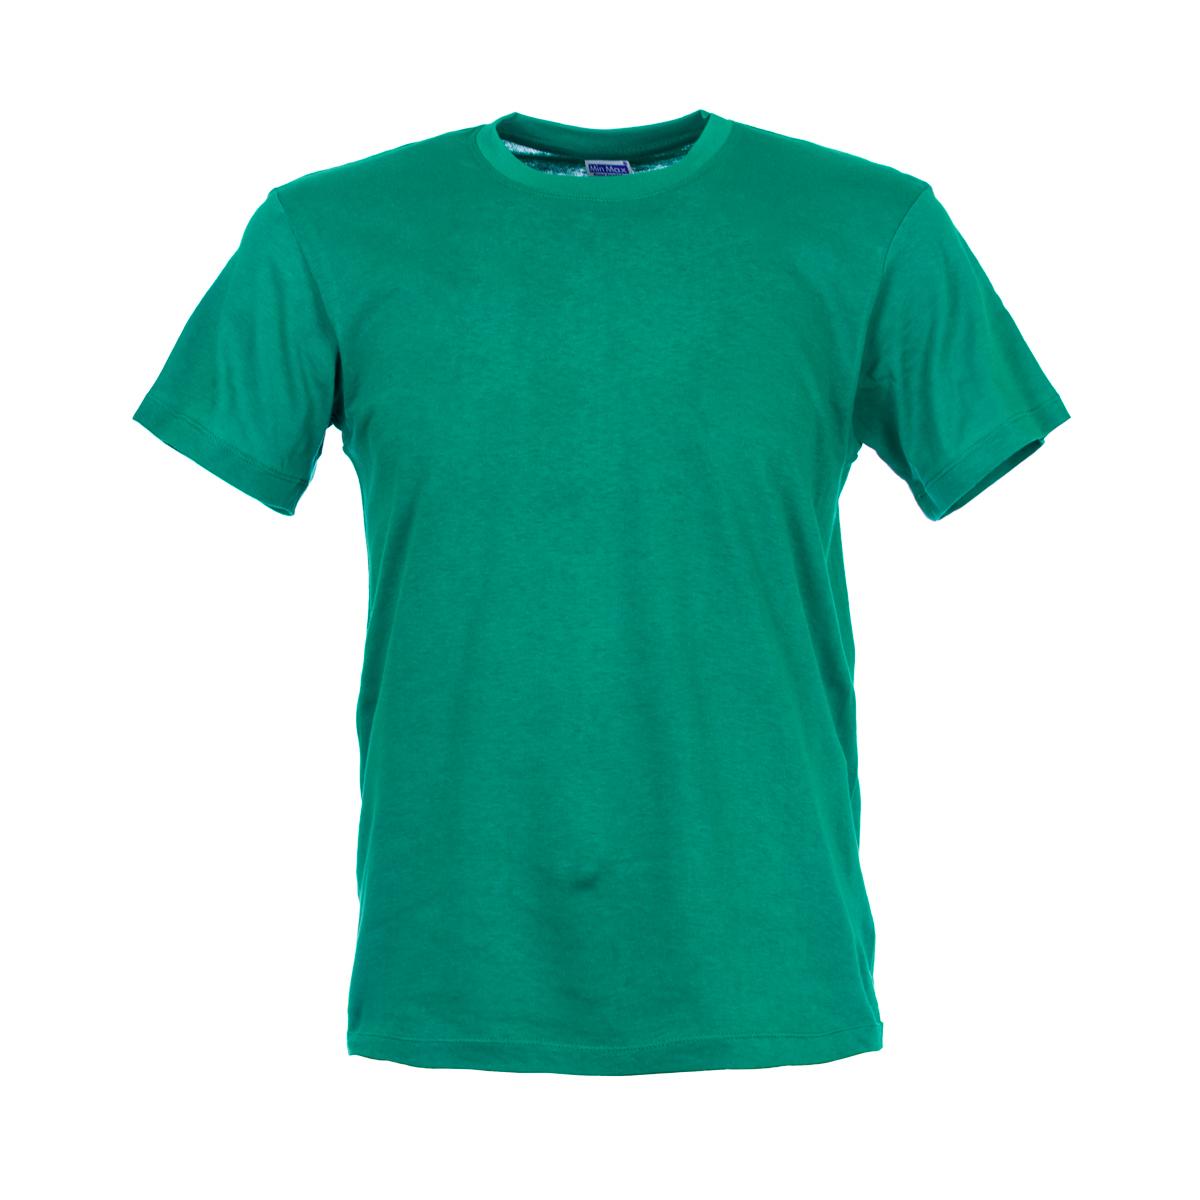 Муж. футболка арт. 04-0054 Зеленый р. 50 Узбекистан